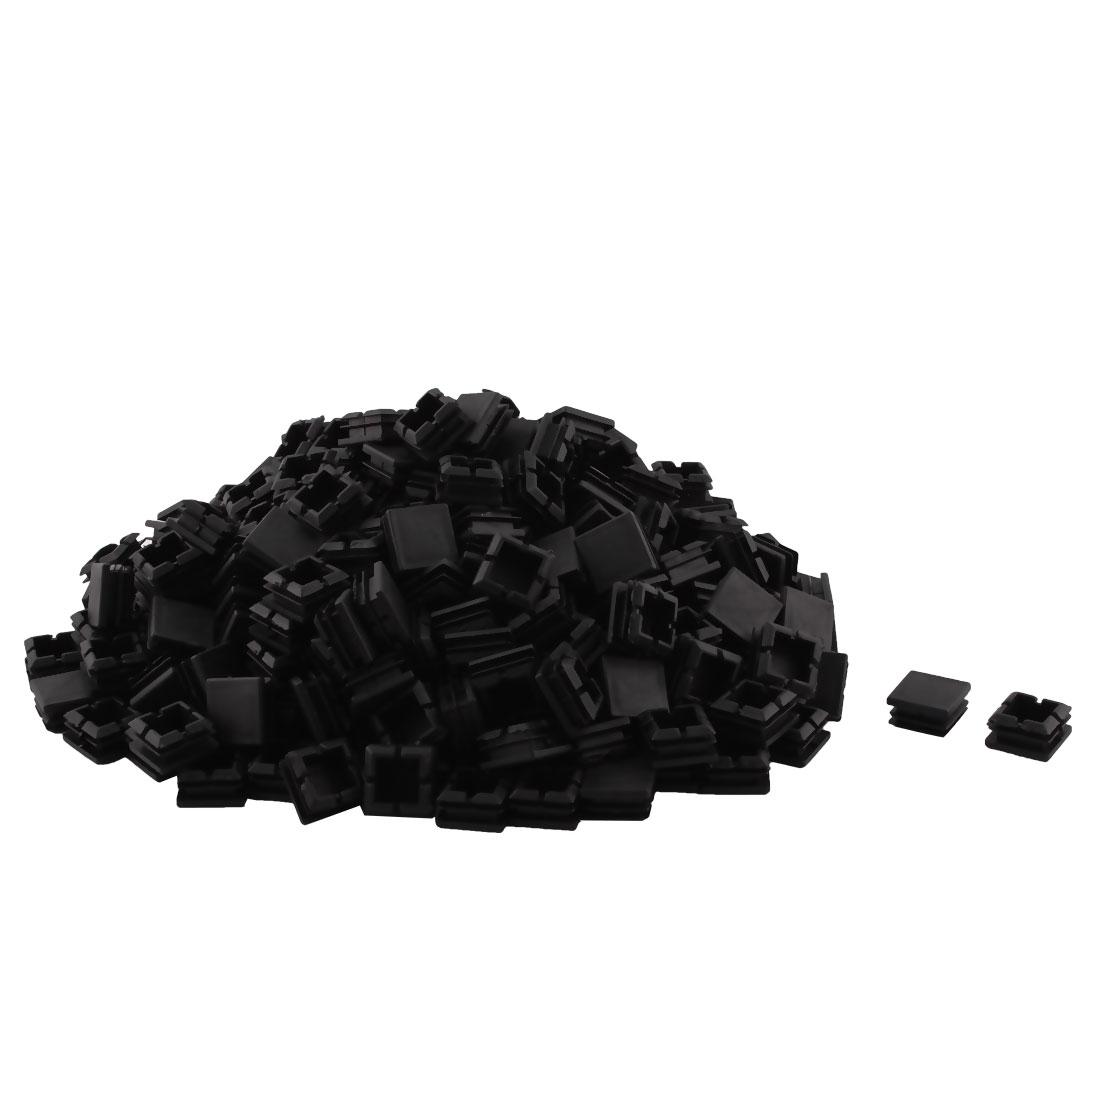 Plastic Square Table Chair Leg Feet Tube Pipe Insert End Cap Black 25mm x 25mm 300pcs